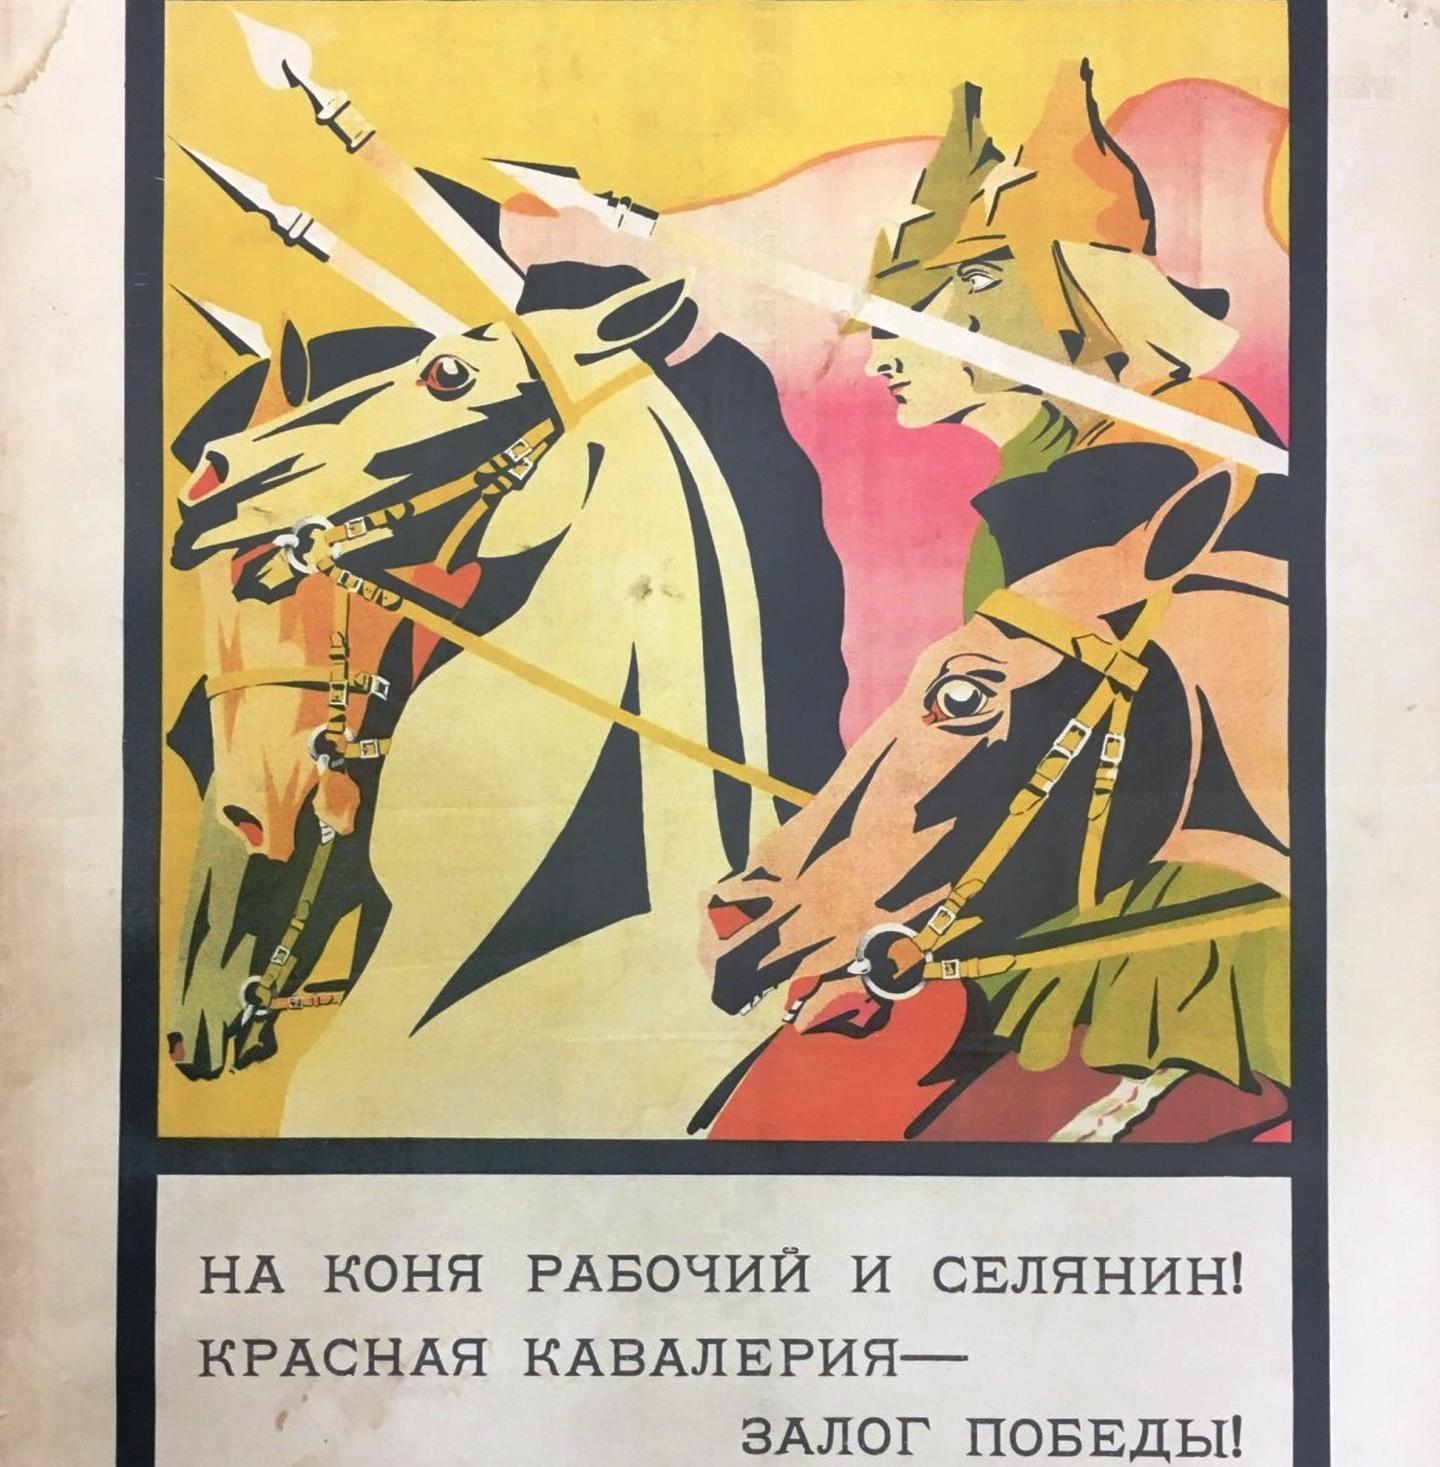 01_Krasnaya_kavaleria